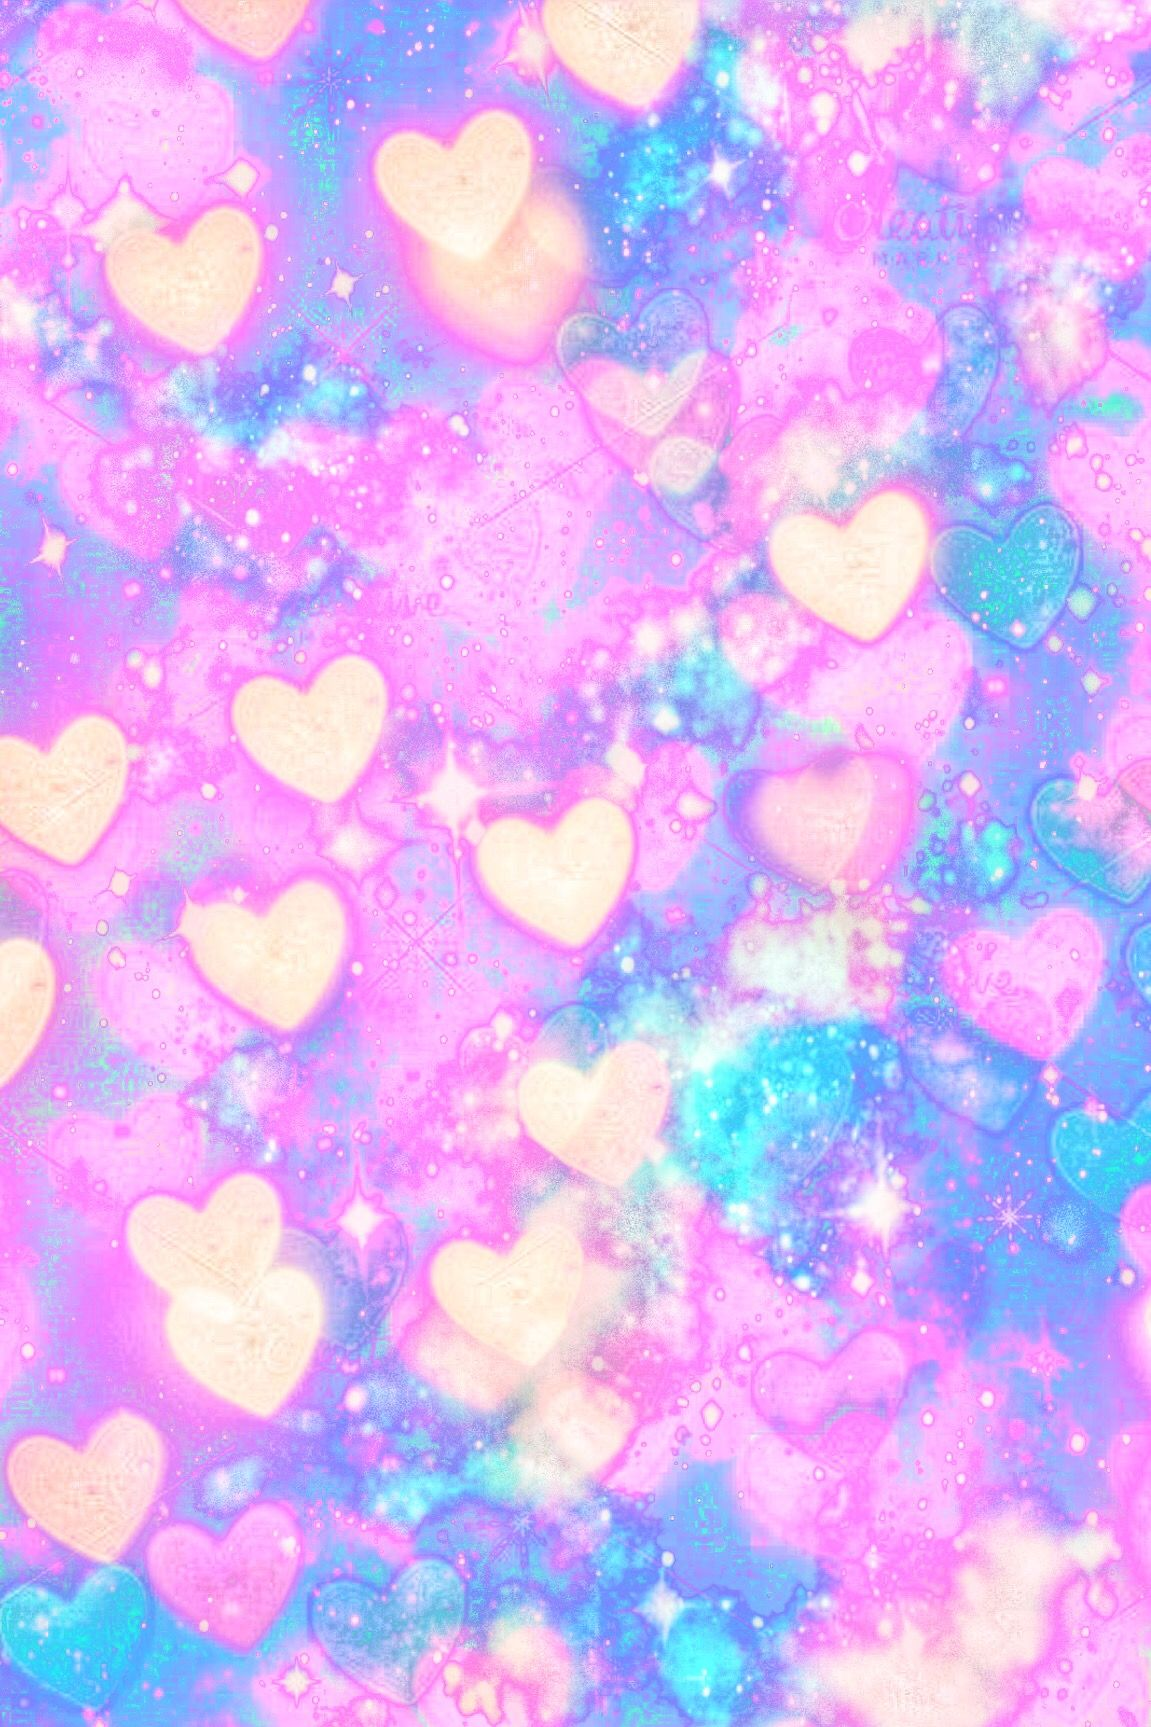 Wallpaper Lockscreen Glitter Sparkle Galaxy Pastel Hearts Love Cute Girly Bokeh Pink Blue Trendy Wallpaper Wallpaper Iphone Love Heart Wallpaper